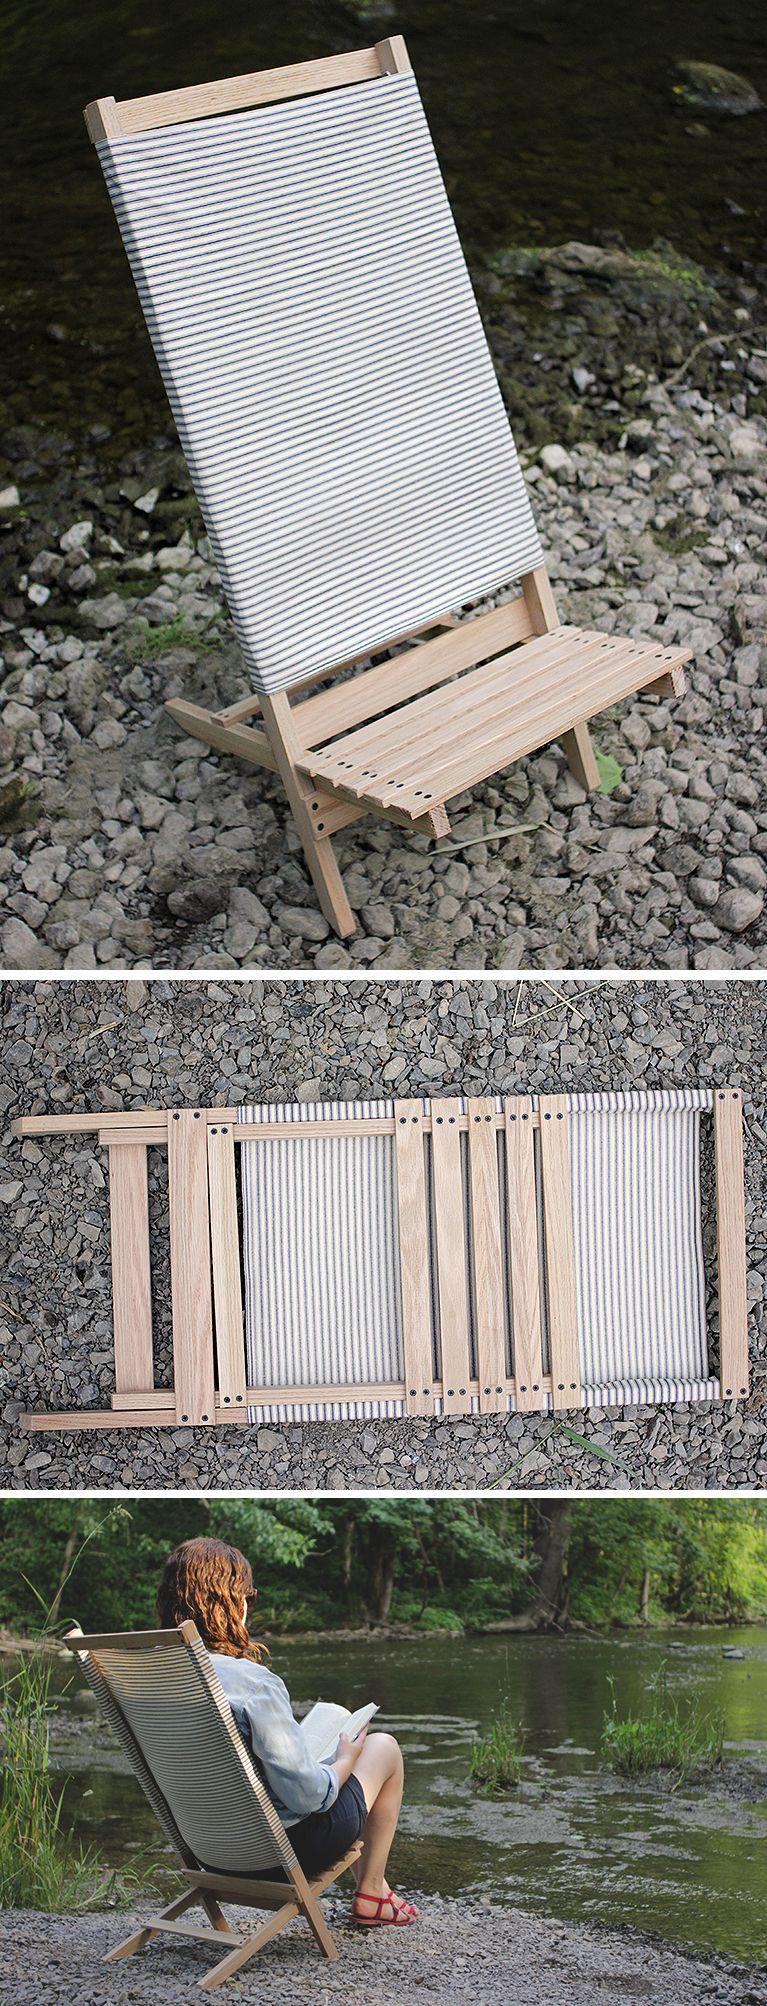 Diy Wooden Camp Beach Chair Diy Crafts Wooden Diy